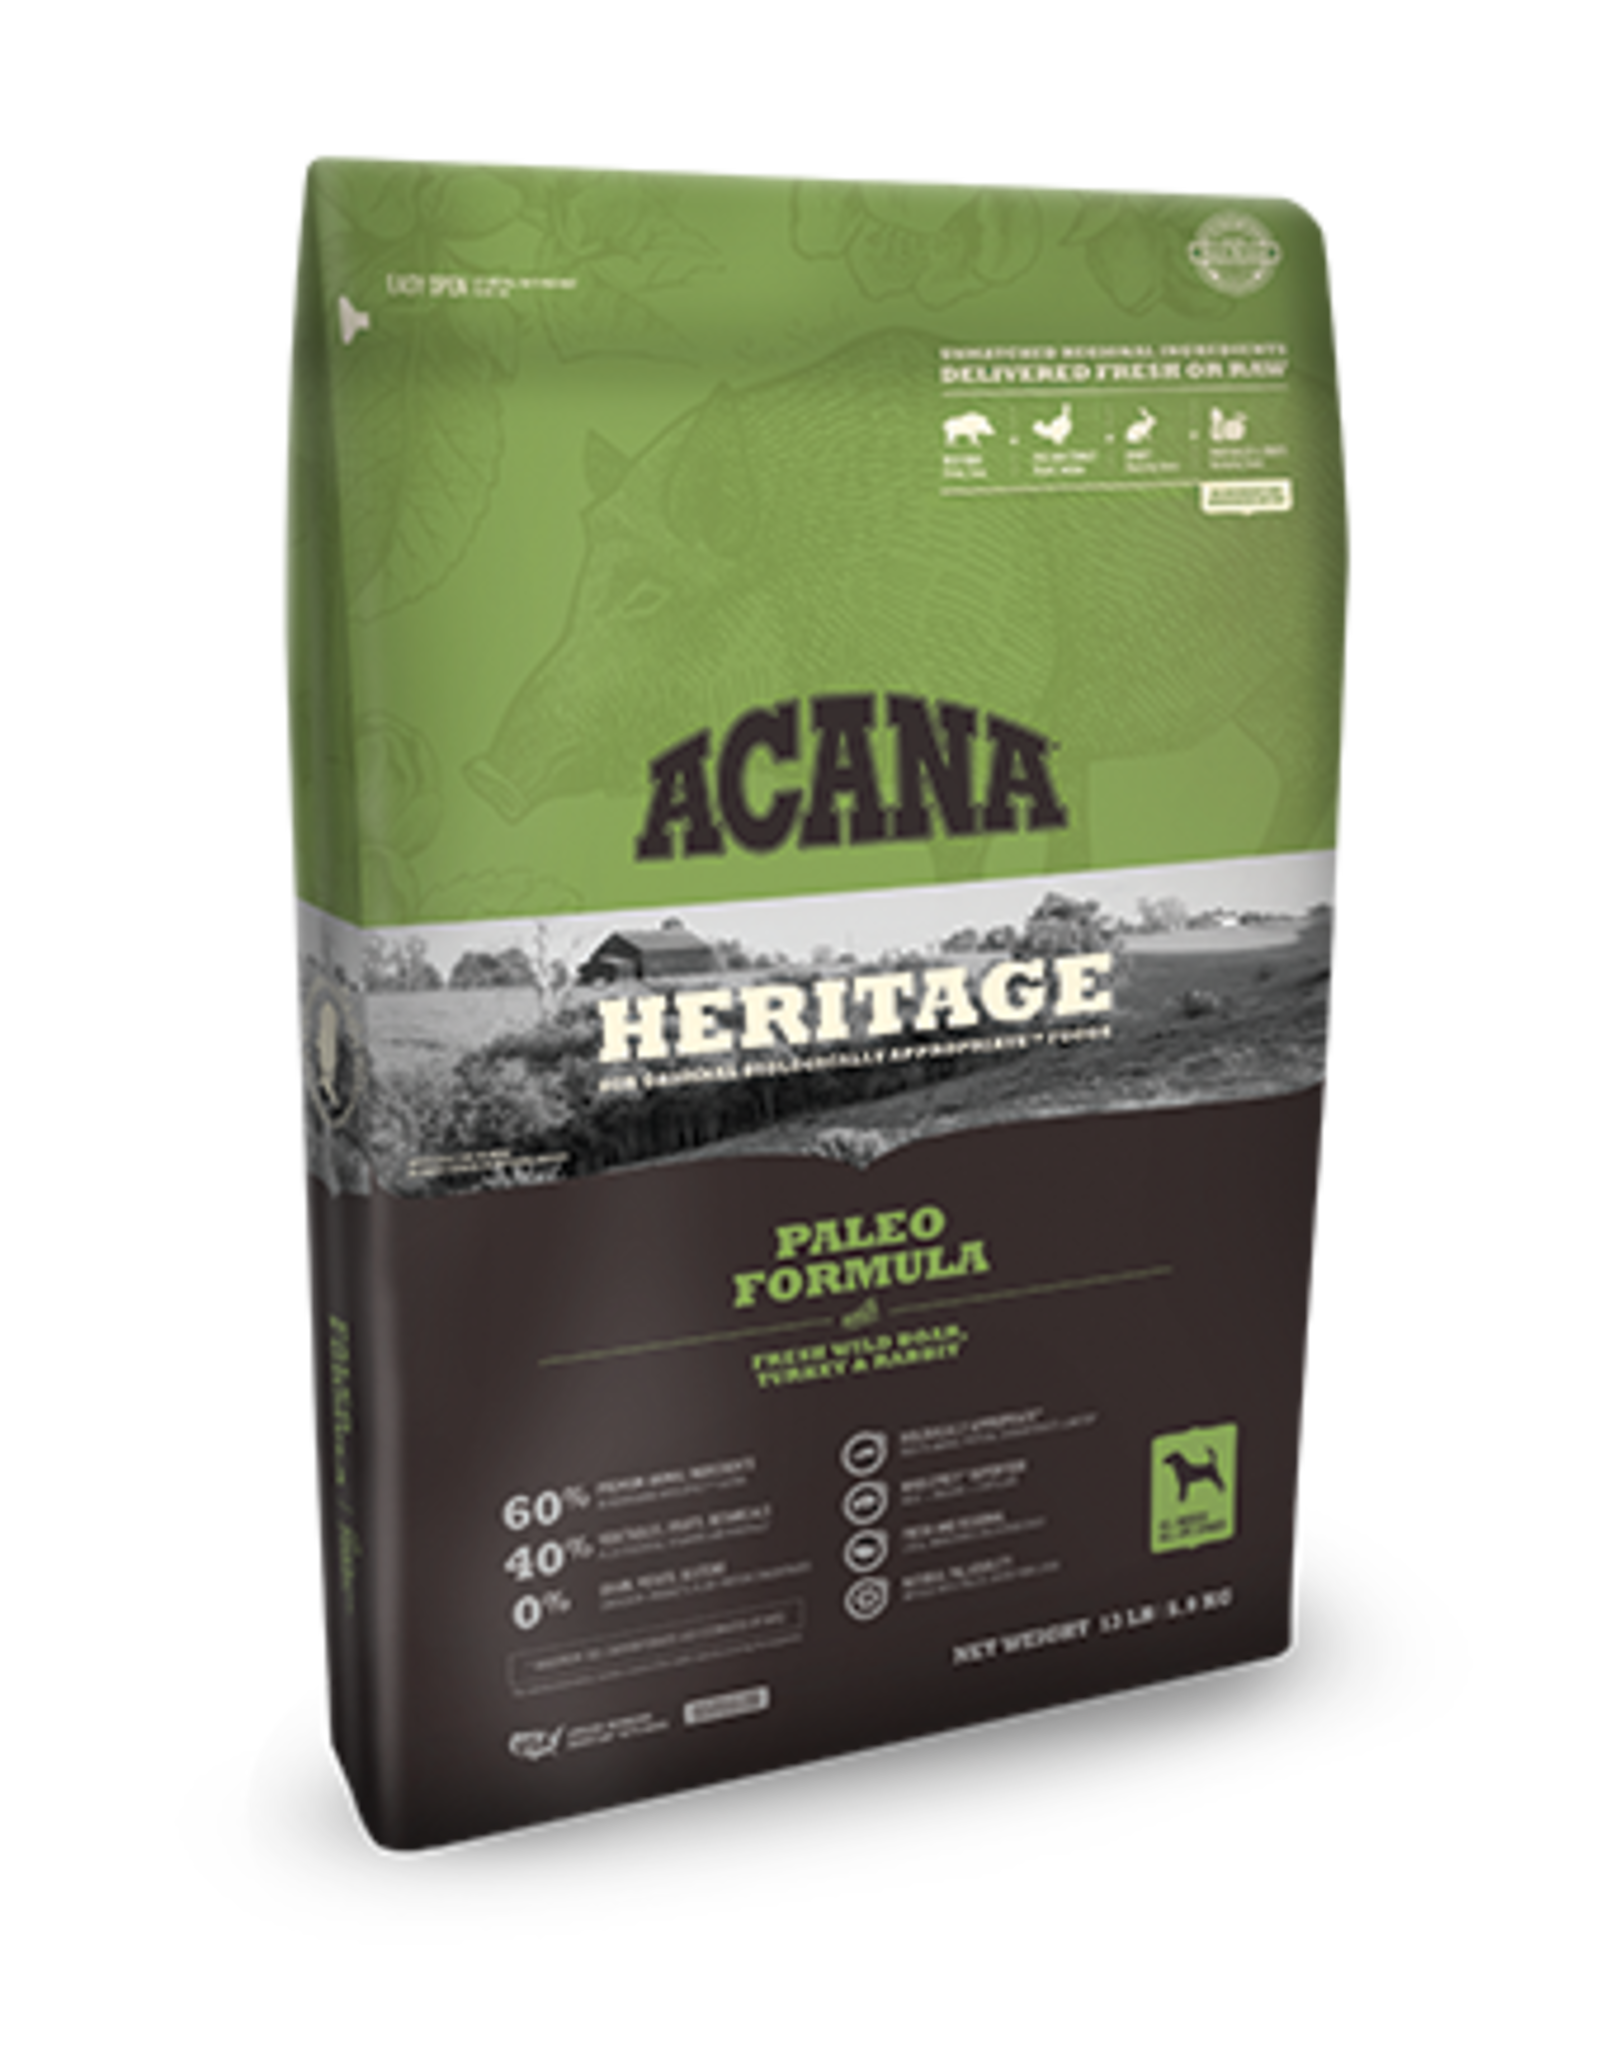 Acana Acana Heritage Dog Food Paleo